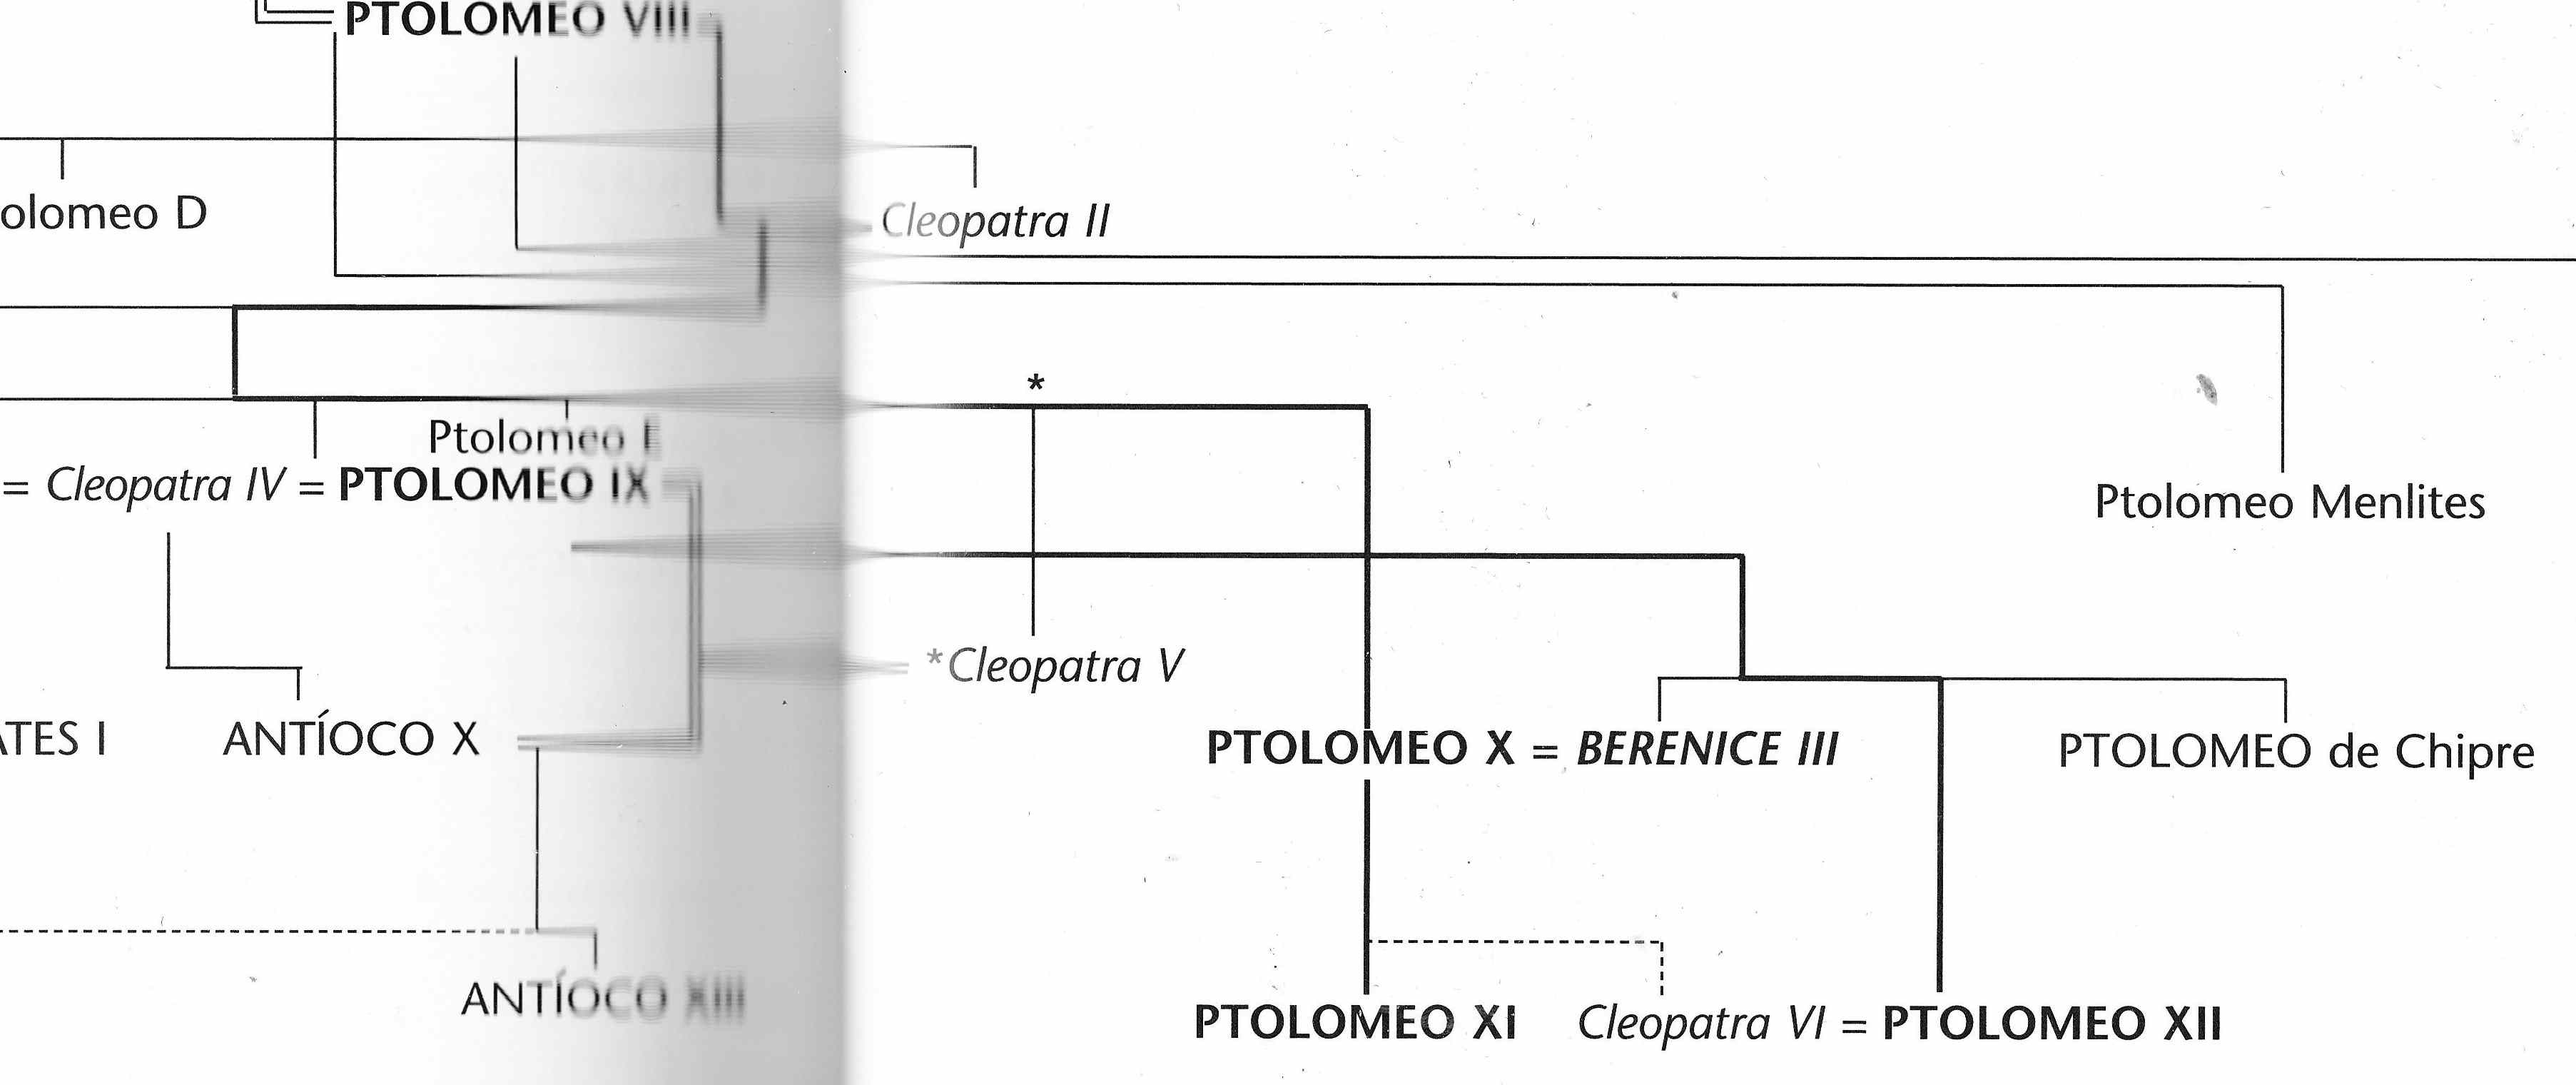 Egipto Antiguo 53 Berenice III y Ptolomeo XI 1